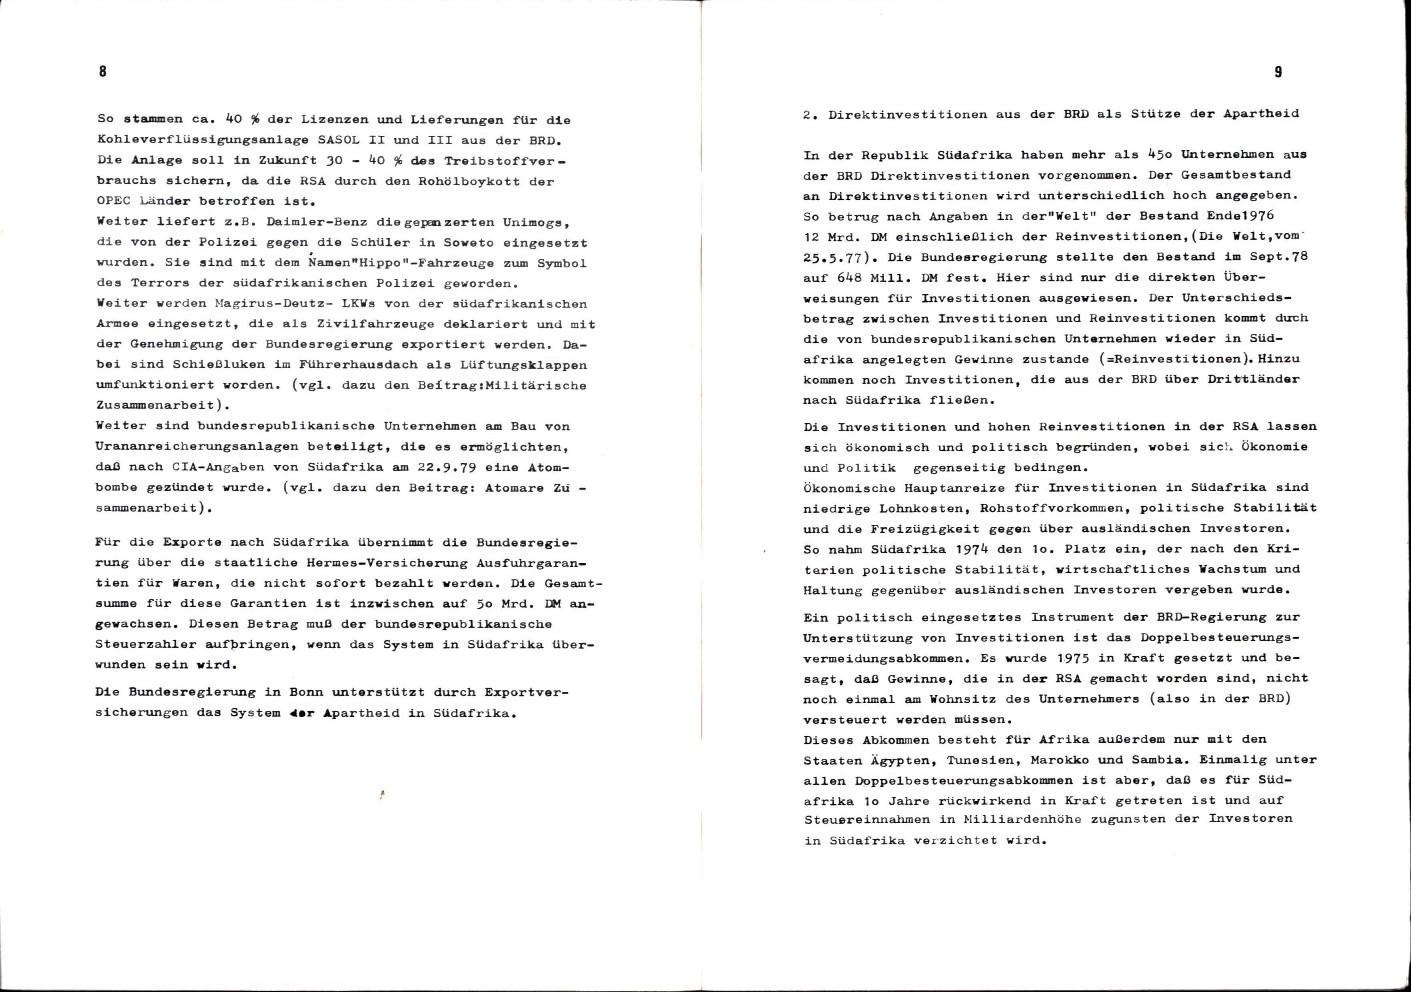 Muenster_AKAFRIK_1981_Suedafrika_BRD_06